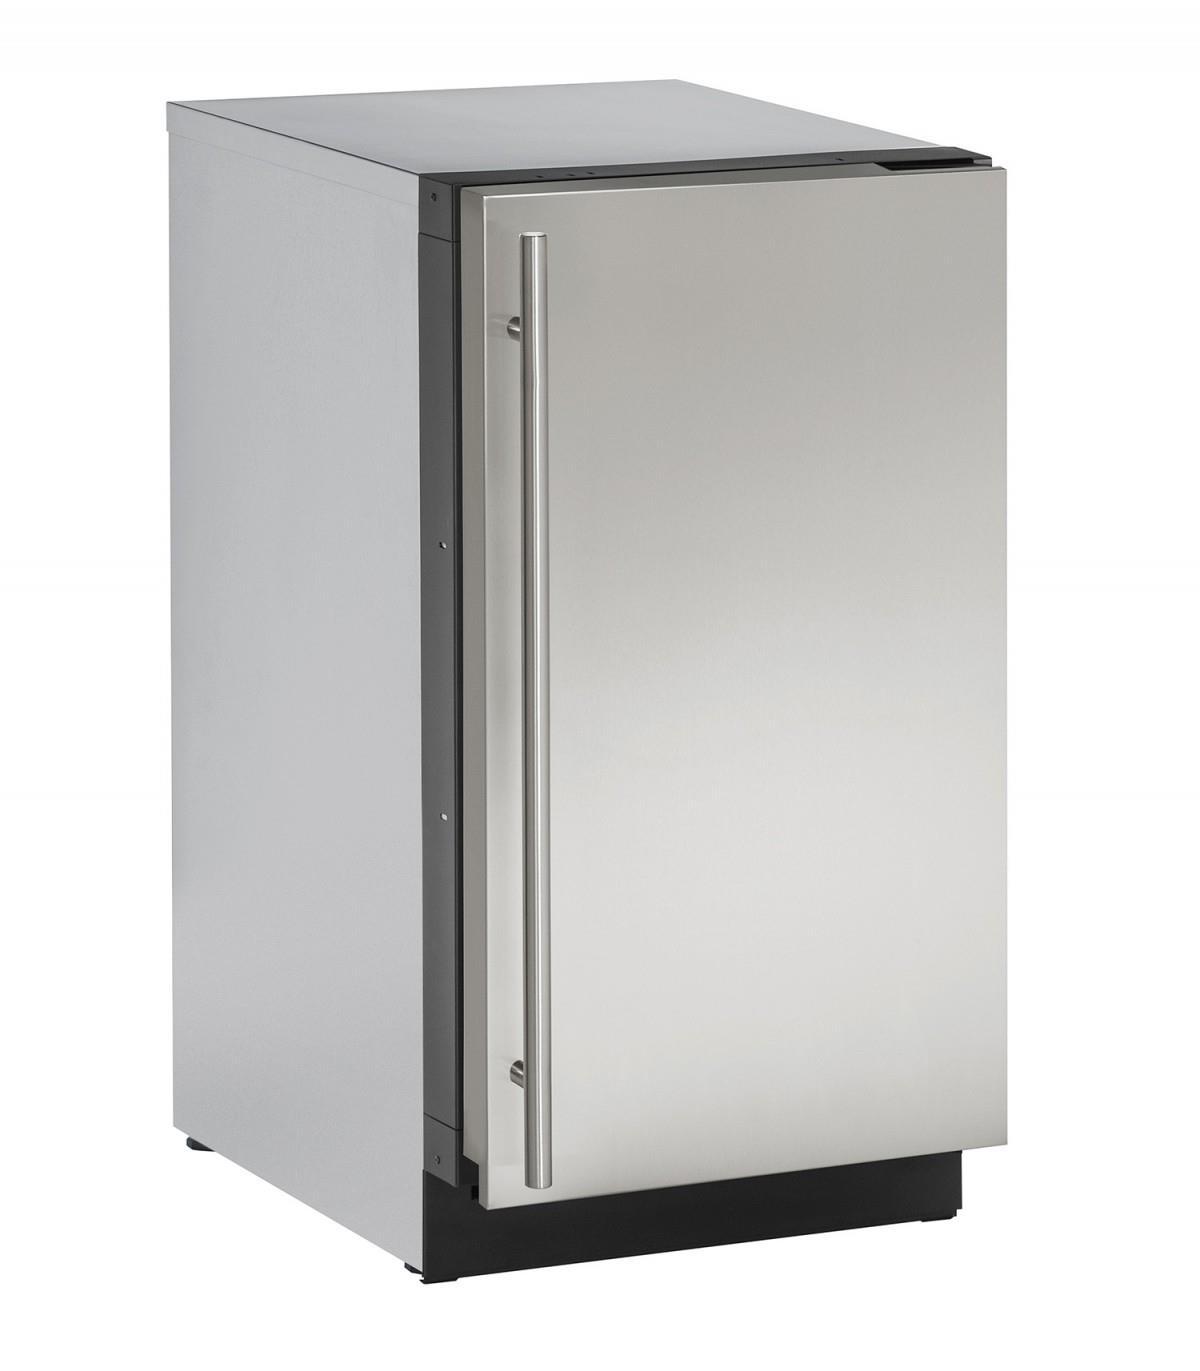 "U-Line Refrigerators 3.4 Cu. Ft. 18"" Compact All-Refrigerator - Item Number: U-2218RS-01A"